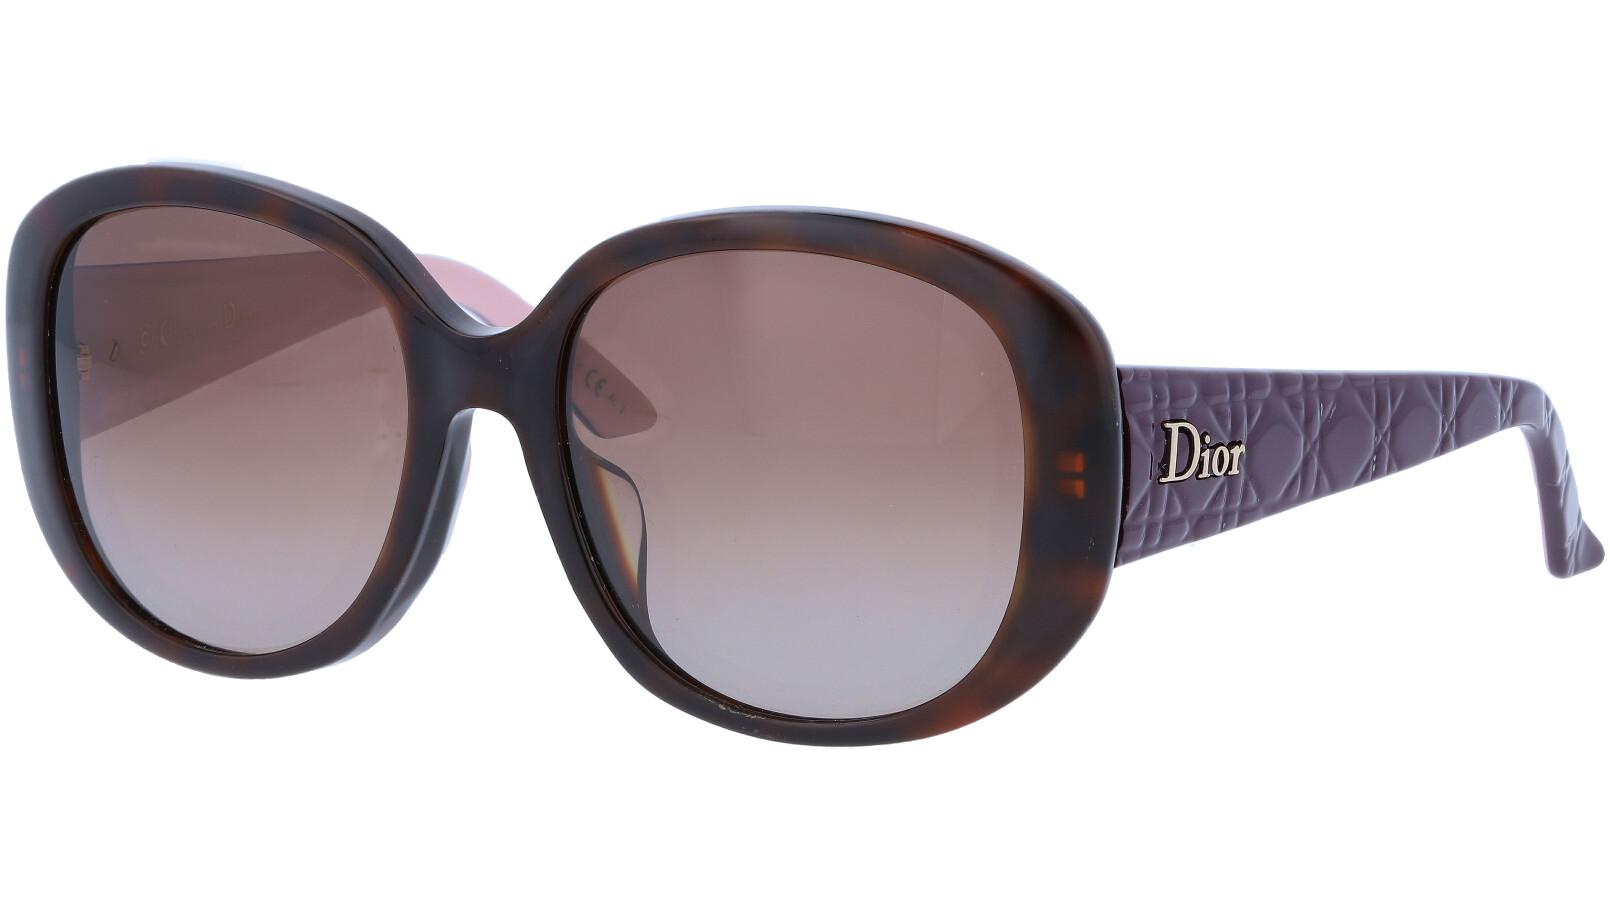 DIOR DIORLADYINDIOR1F CZZLA 55 PURPLE Sunglasses